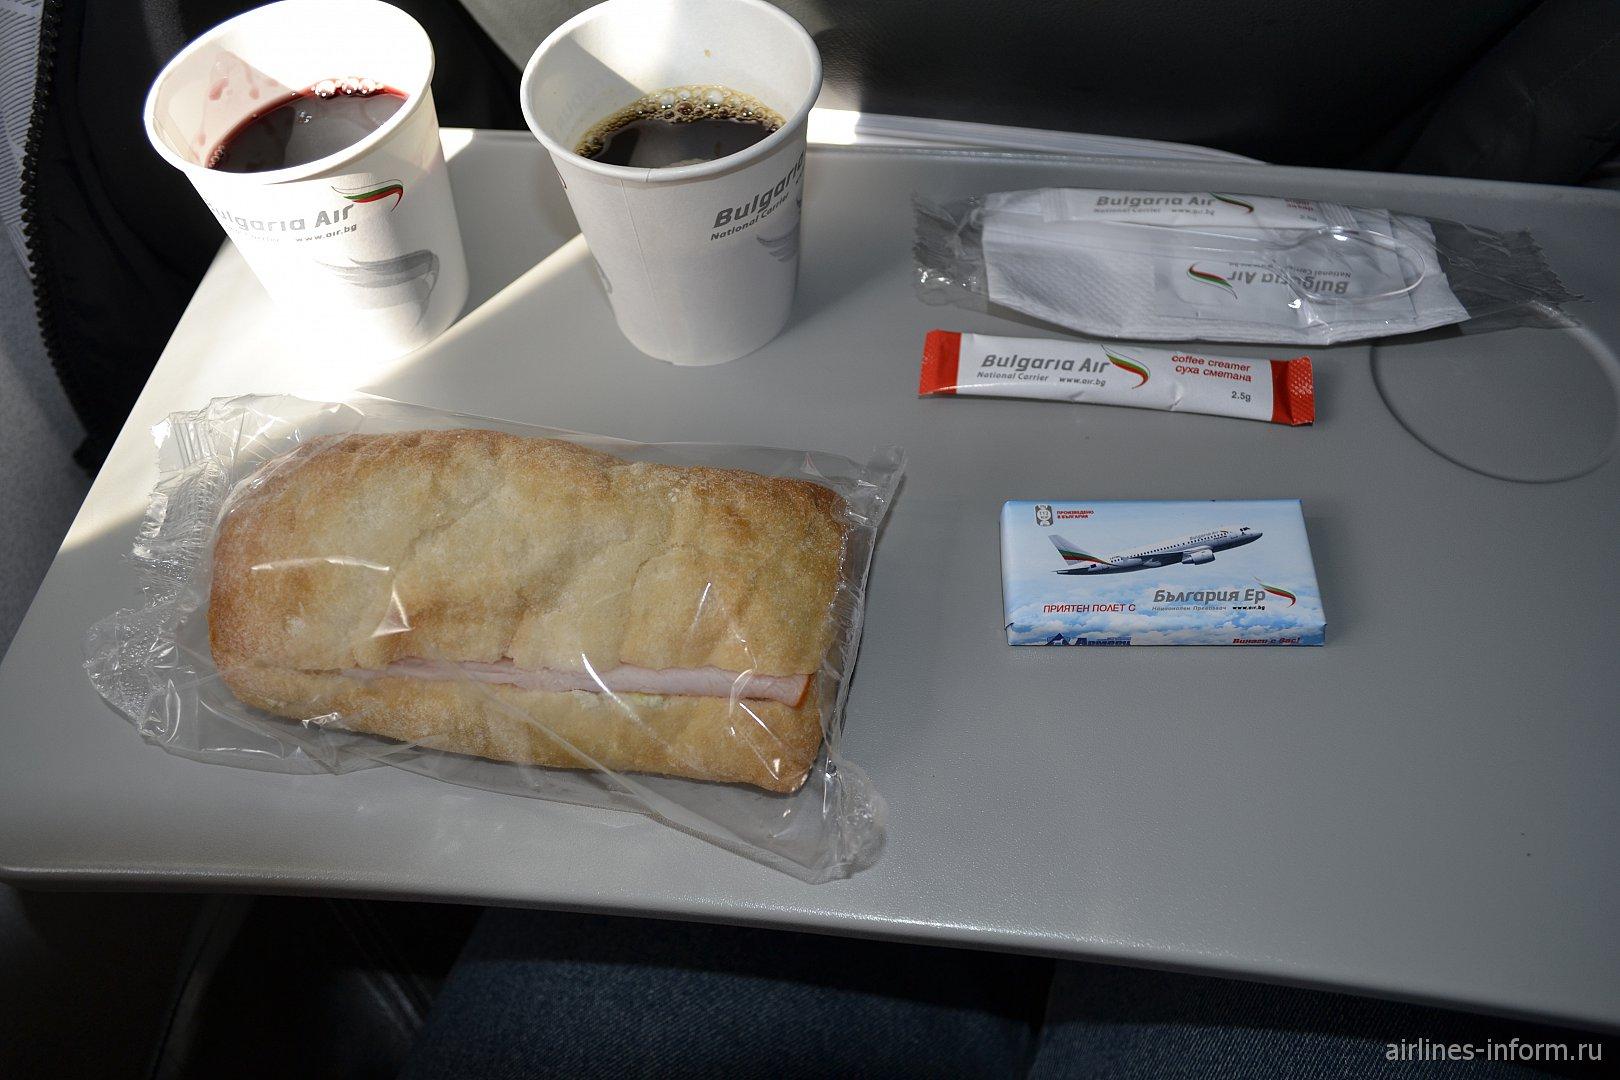 Бортпитание на рейсе София-Москва авиакомпании Bulgaria Air